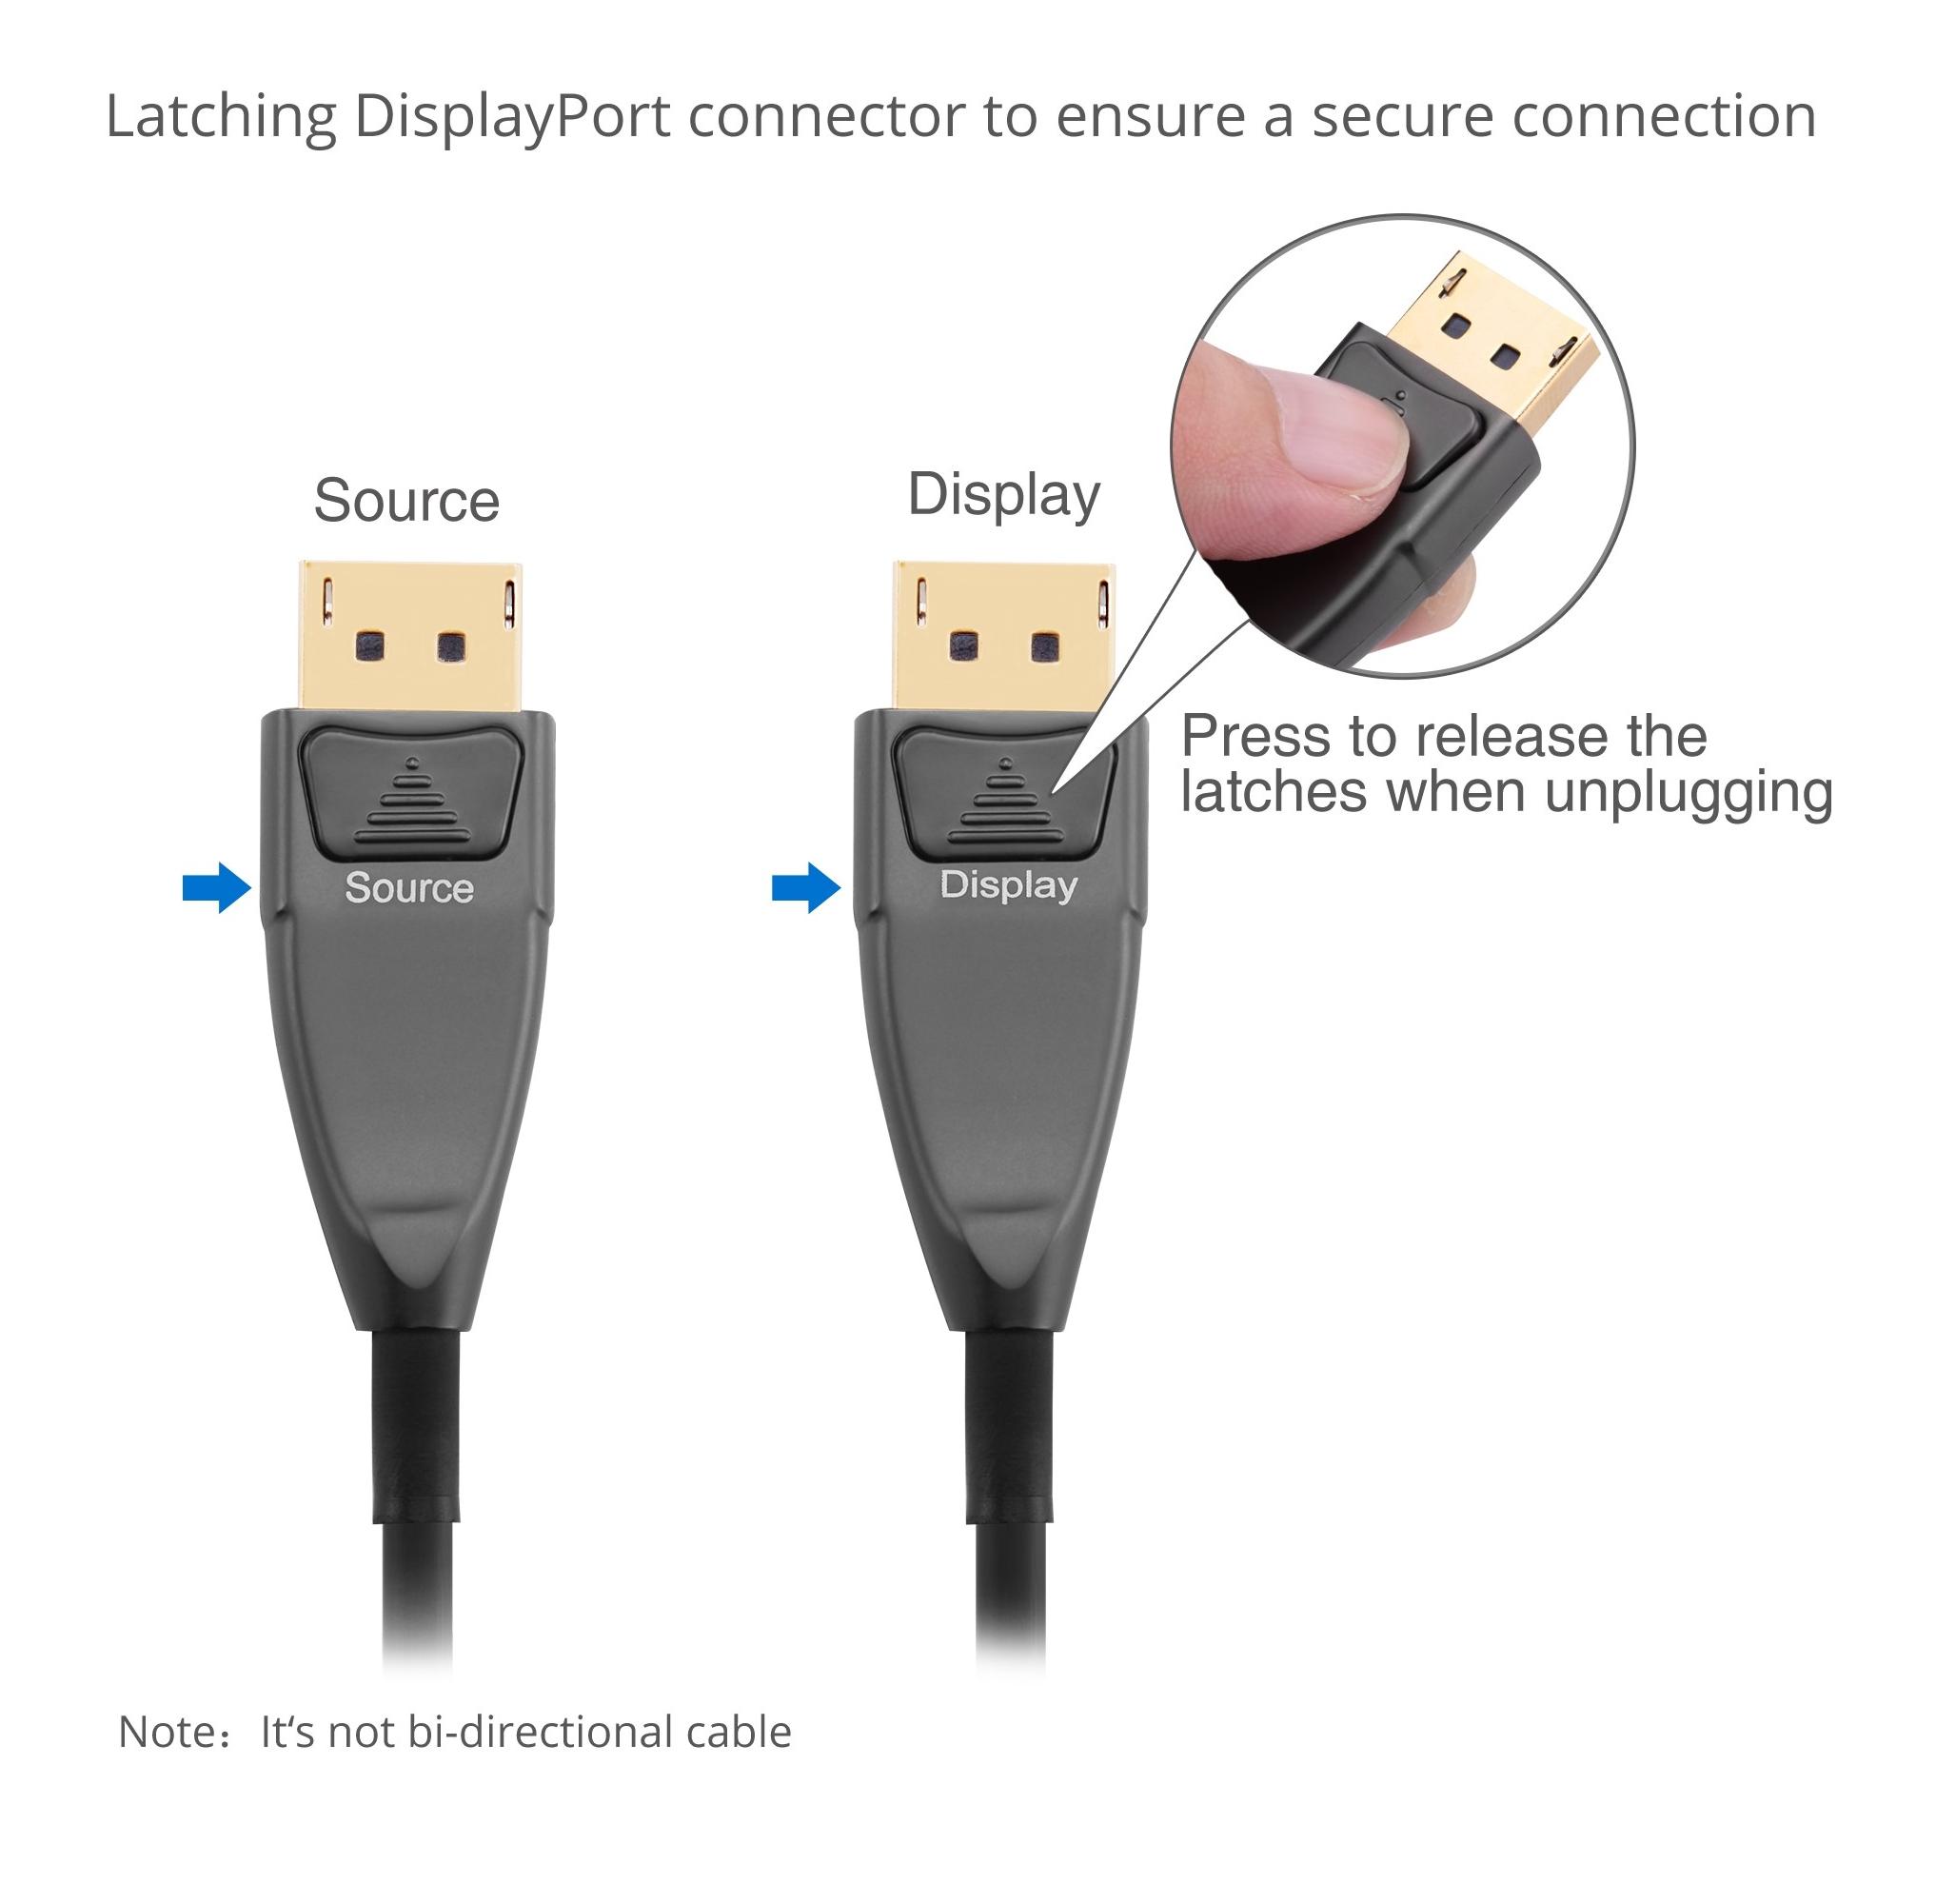 Pacroban 8K DisplayPort 1.4 Cable 240Hz G-sync HBR3 HDR 10+ 4K 144Hz // 120Hz DSC - DP 1.4 Cable Braided 10ft